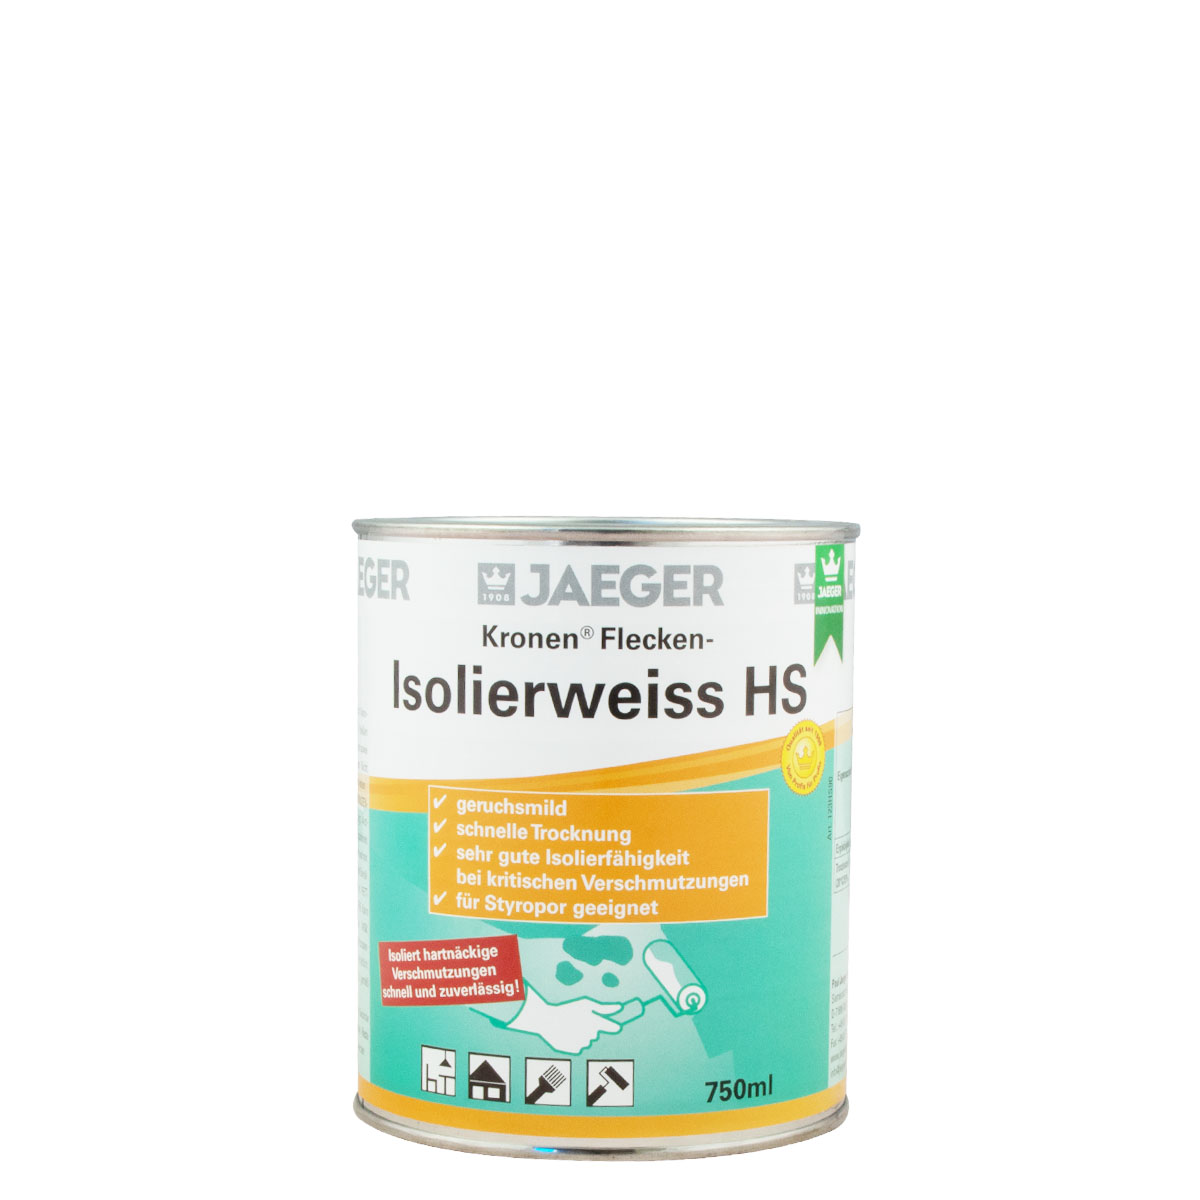 Jaeger Kronen Flecken-Isolierweiss HS123 750ml